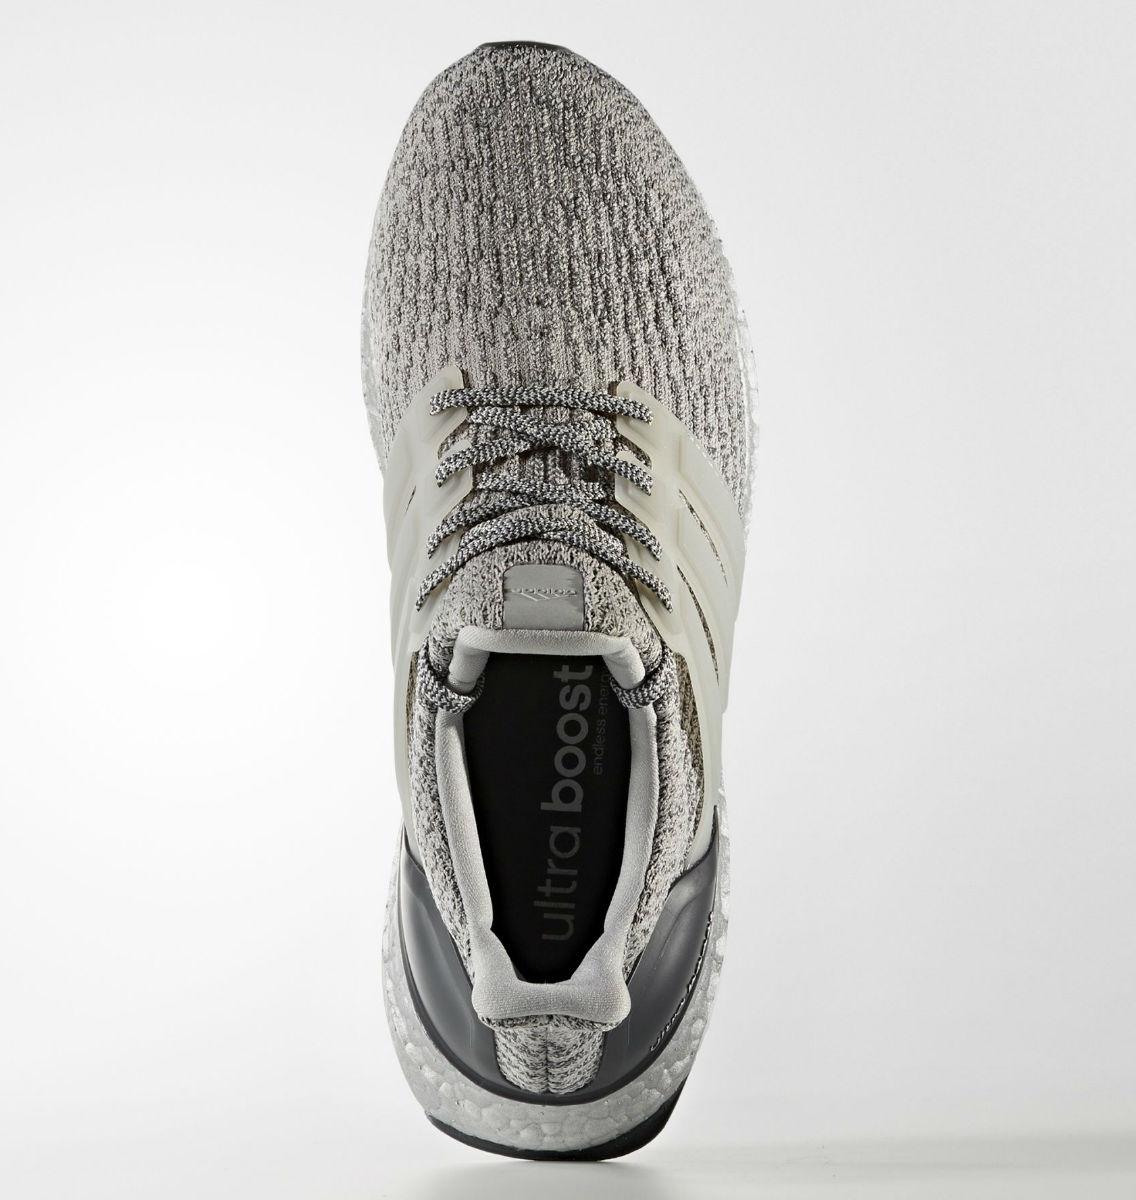 1a1b4189c Adidas Ultra Boost 3.0 Silver Top BA8143